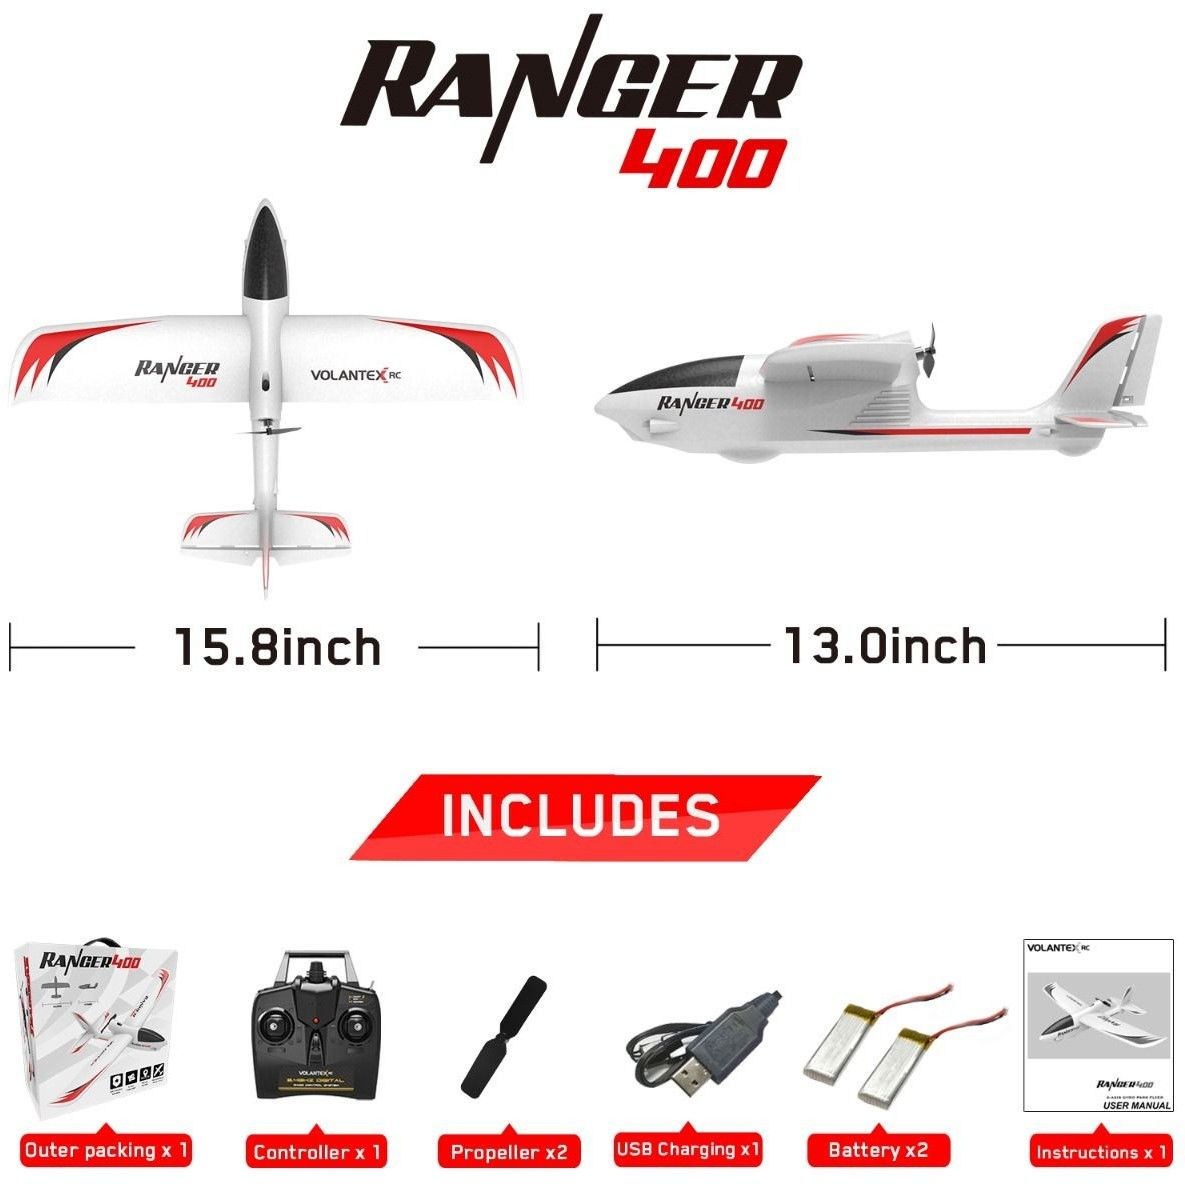 Volantex RC Ranger 400 Samolot z żyroskopem 761-6 RTF